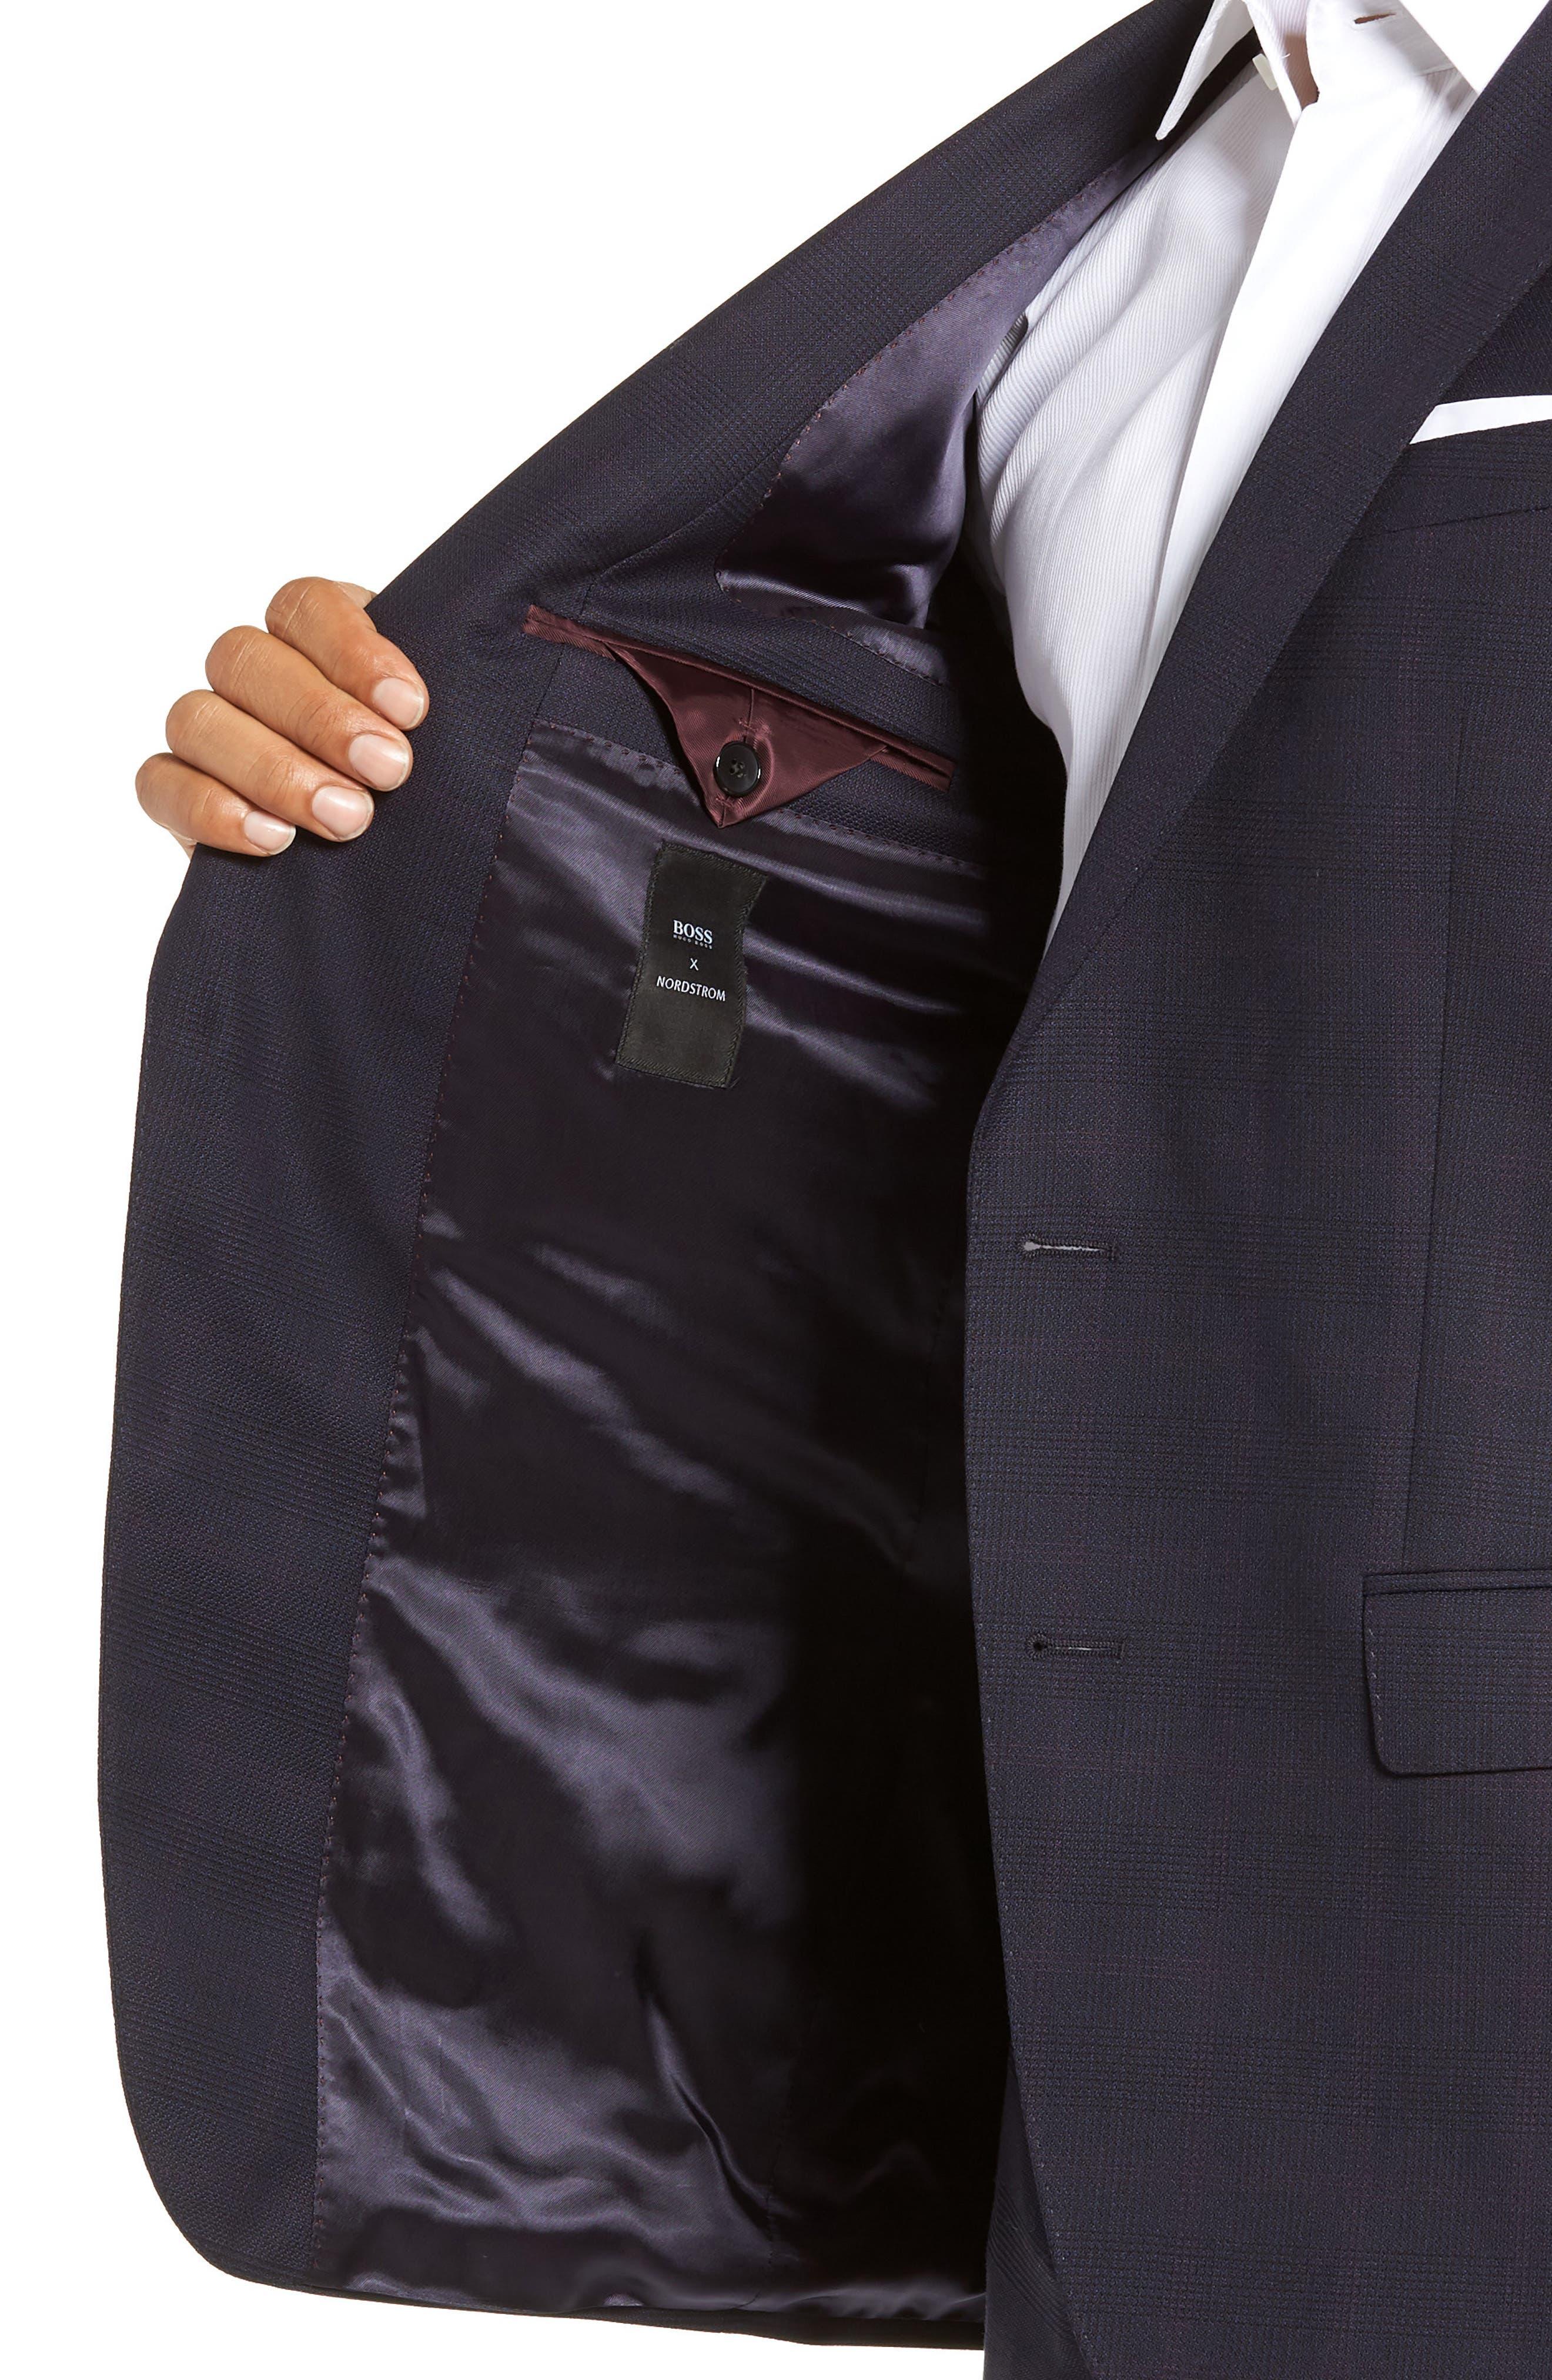 x Nordstrom Huge/Genius Trim Fit Plaid Wool Suit,                             Alternate thumbnail 5, color,                             NAVY